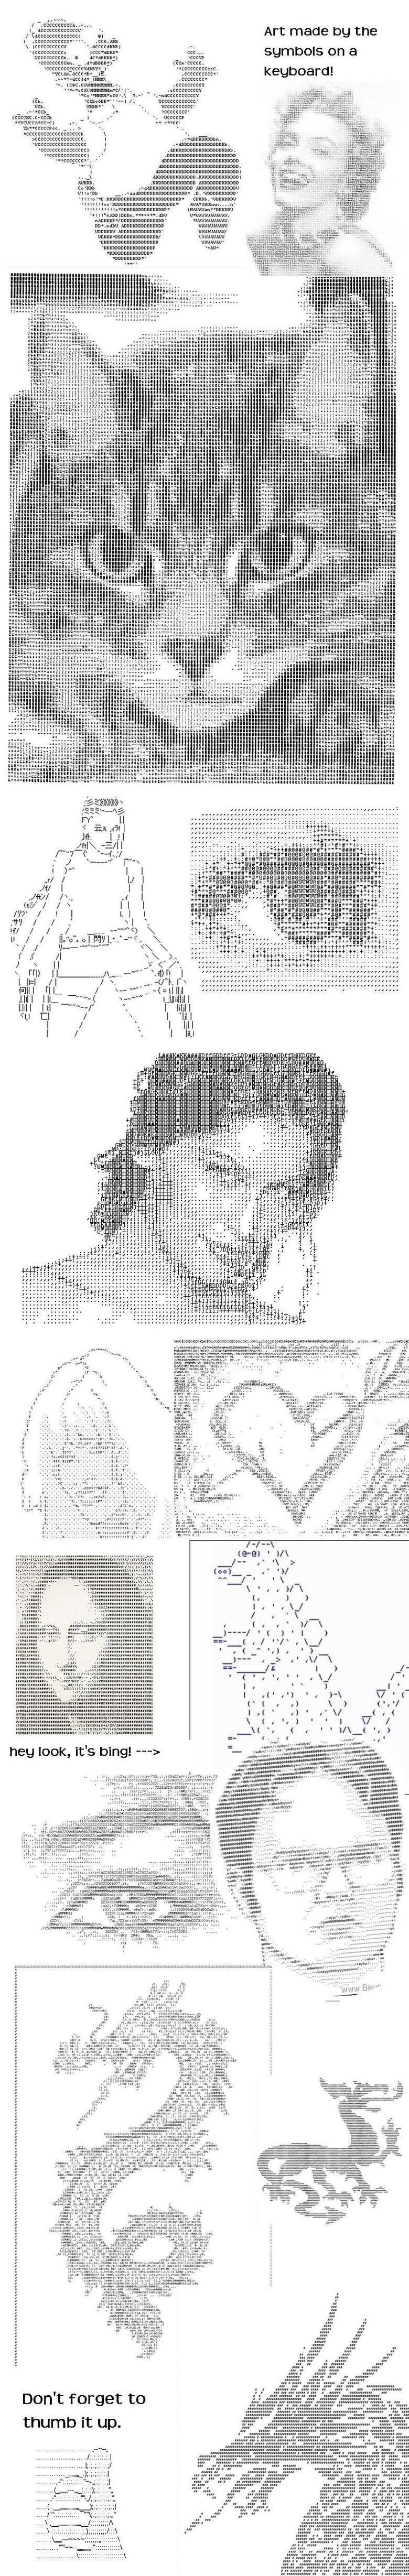 ASCII Art. Pretty cool, huh?.. dwight ascii Art cool Awesome